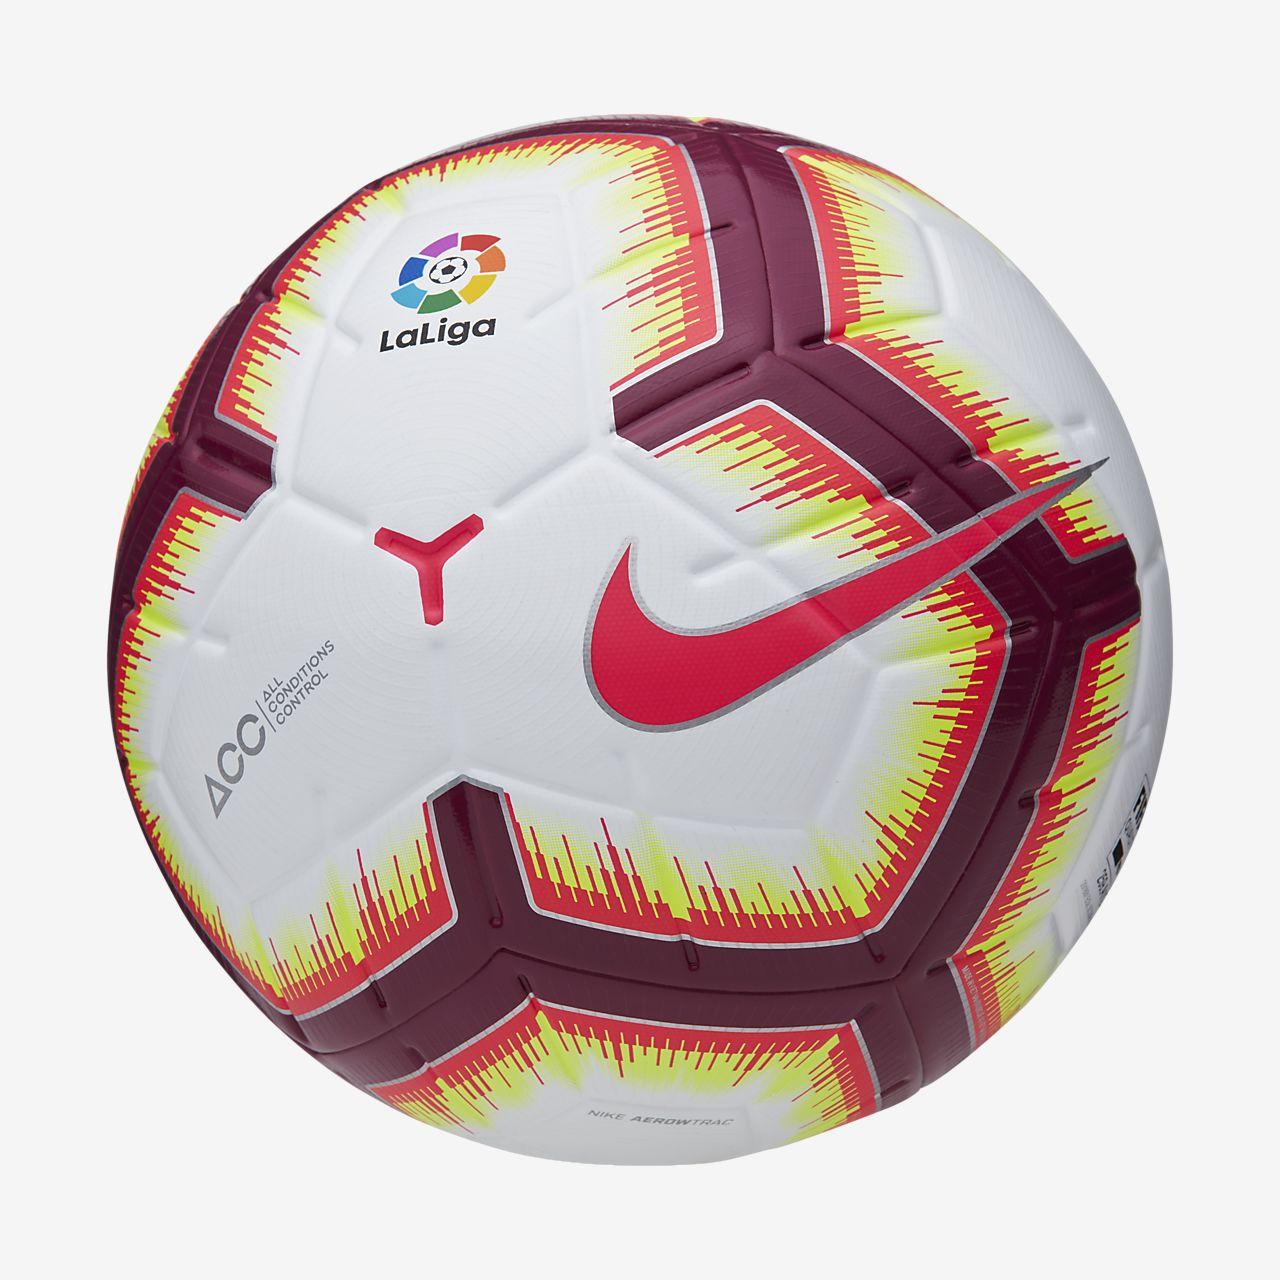 cad49b01bc583 Balón de fútbol La Liga Skills. Nike.com MX